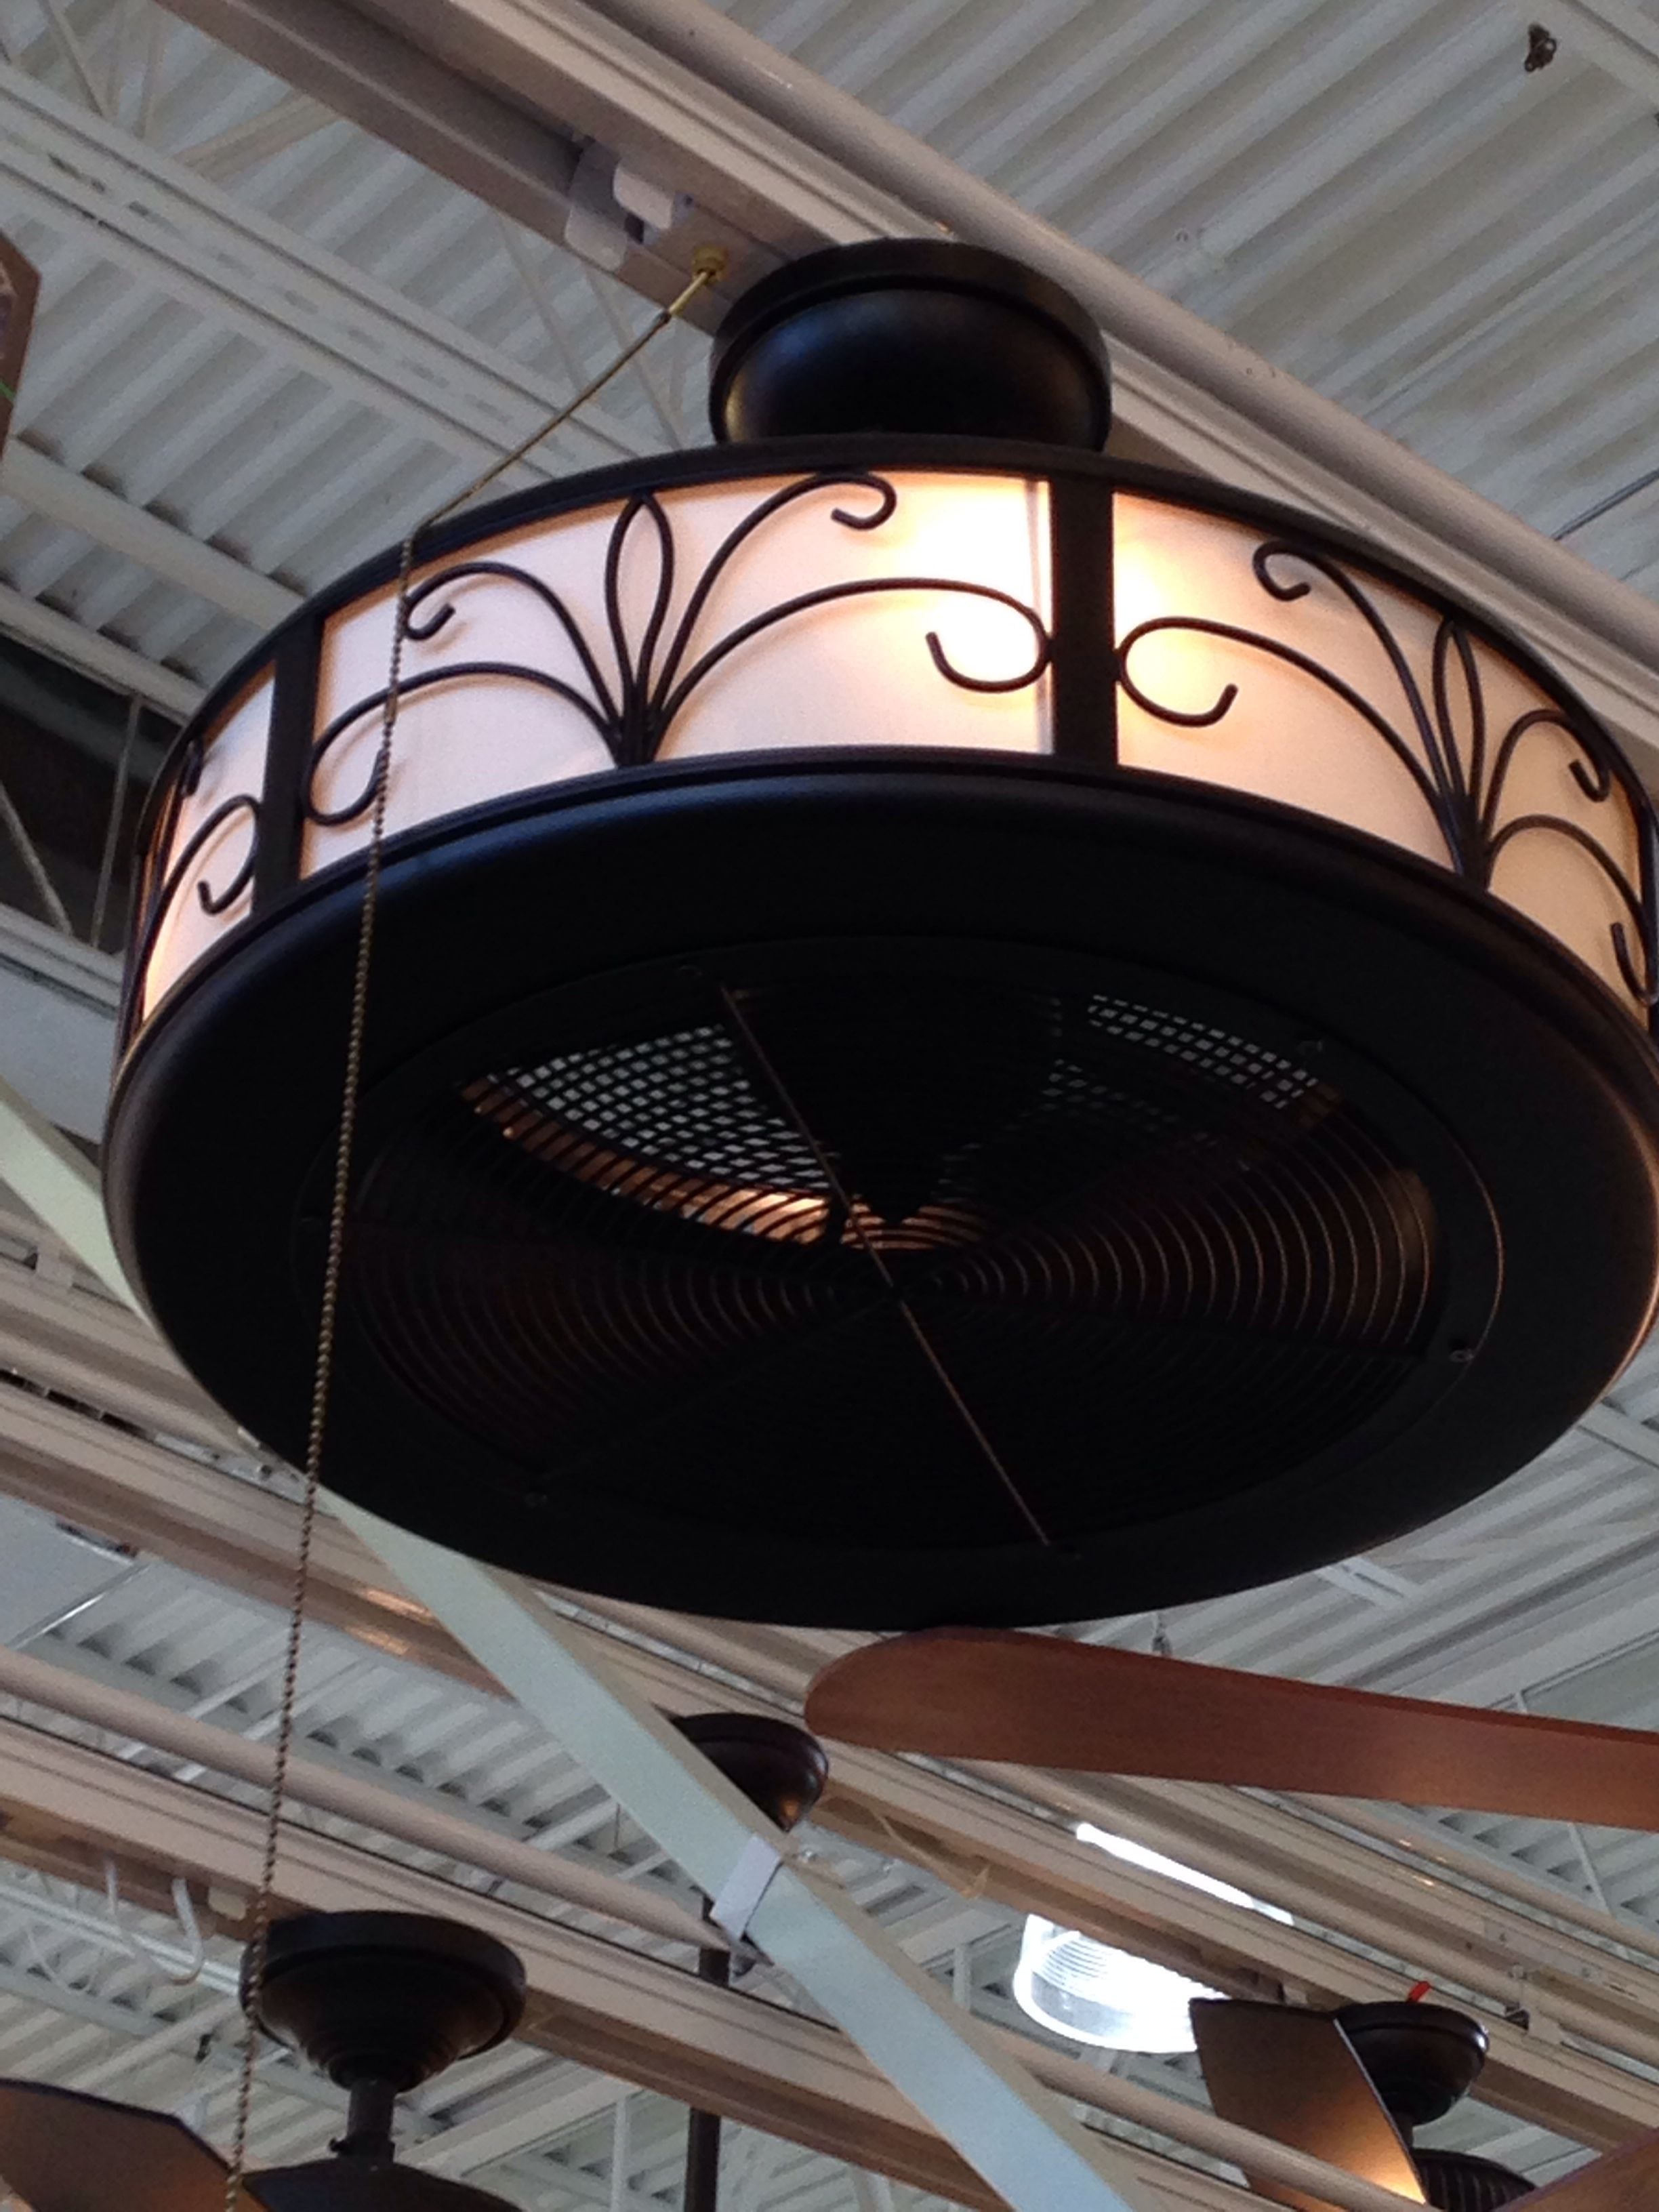 Fandelier- want this in my next kitchen! | Tucson decor ...